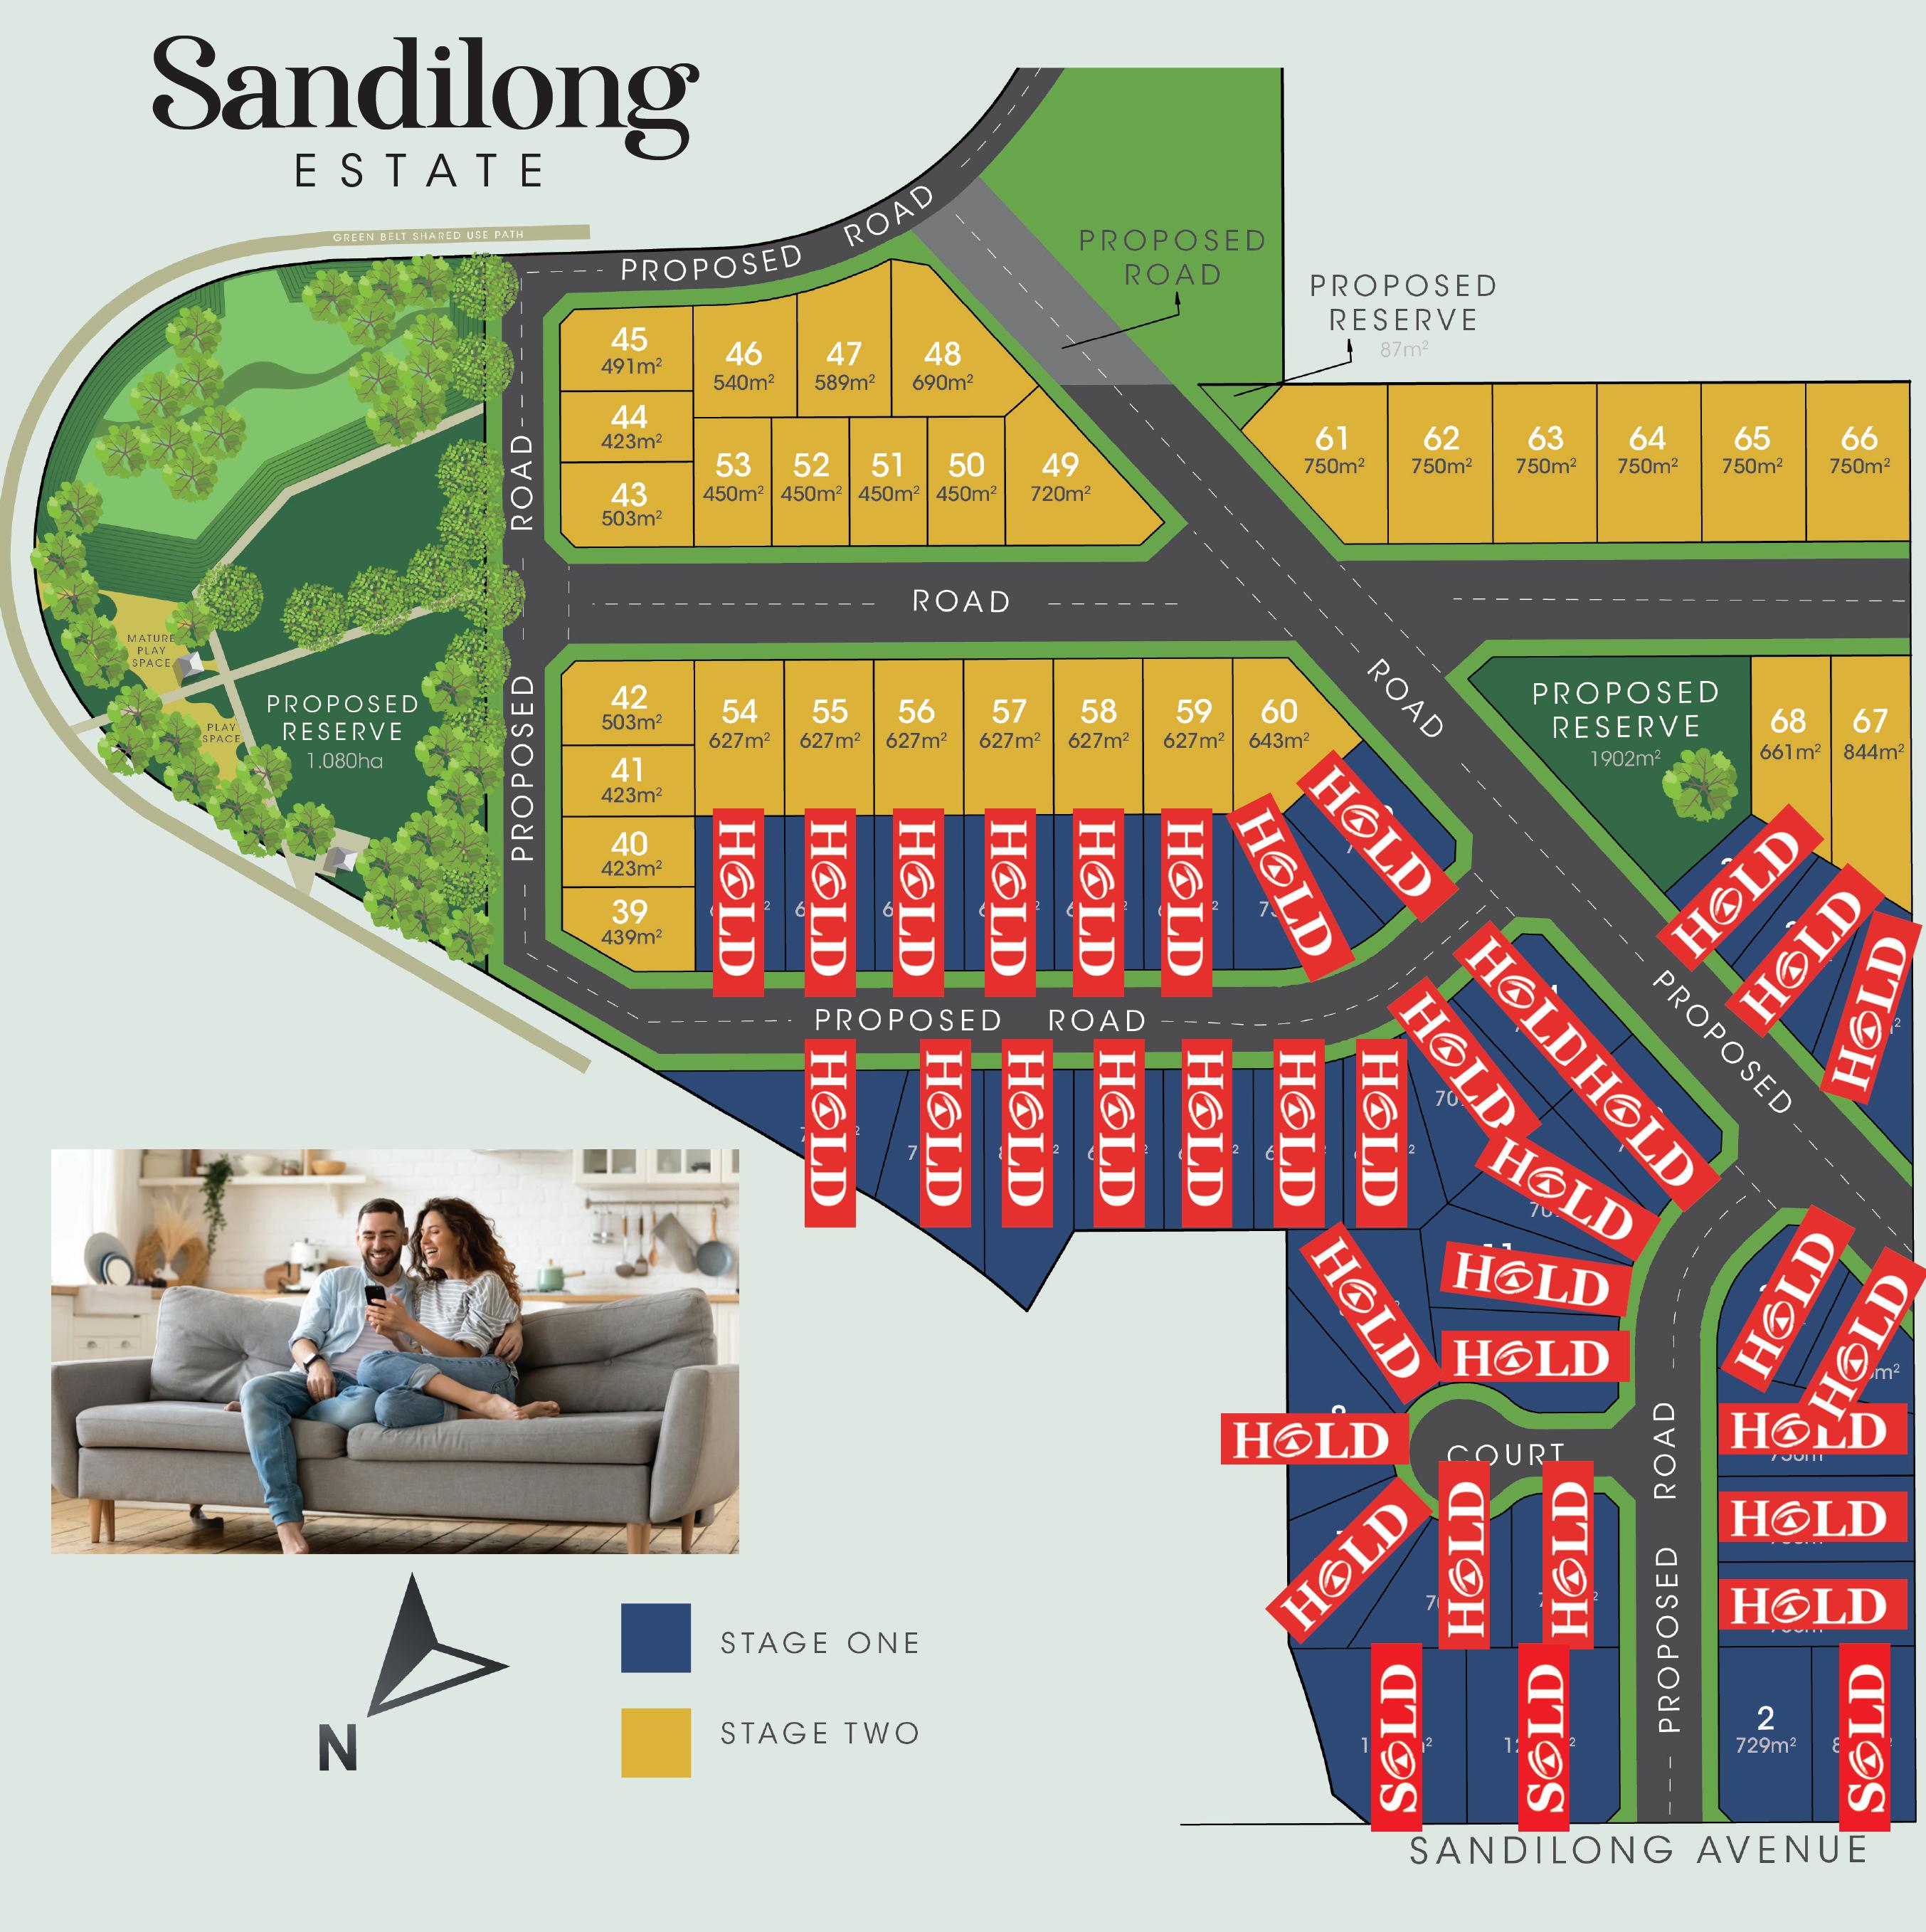 Lot 2/700 Sandilong Avenue, Irymple, VIC 3498